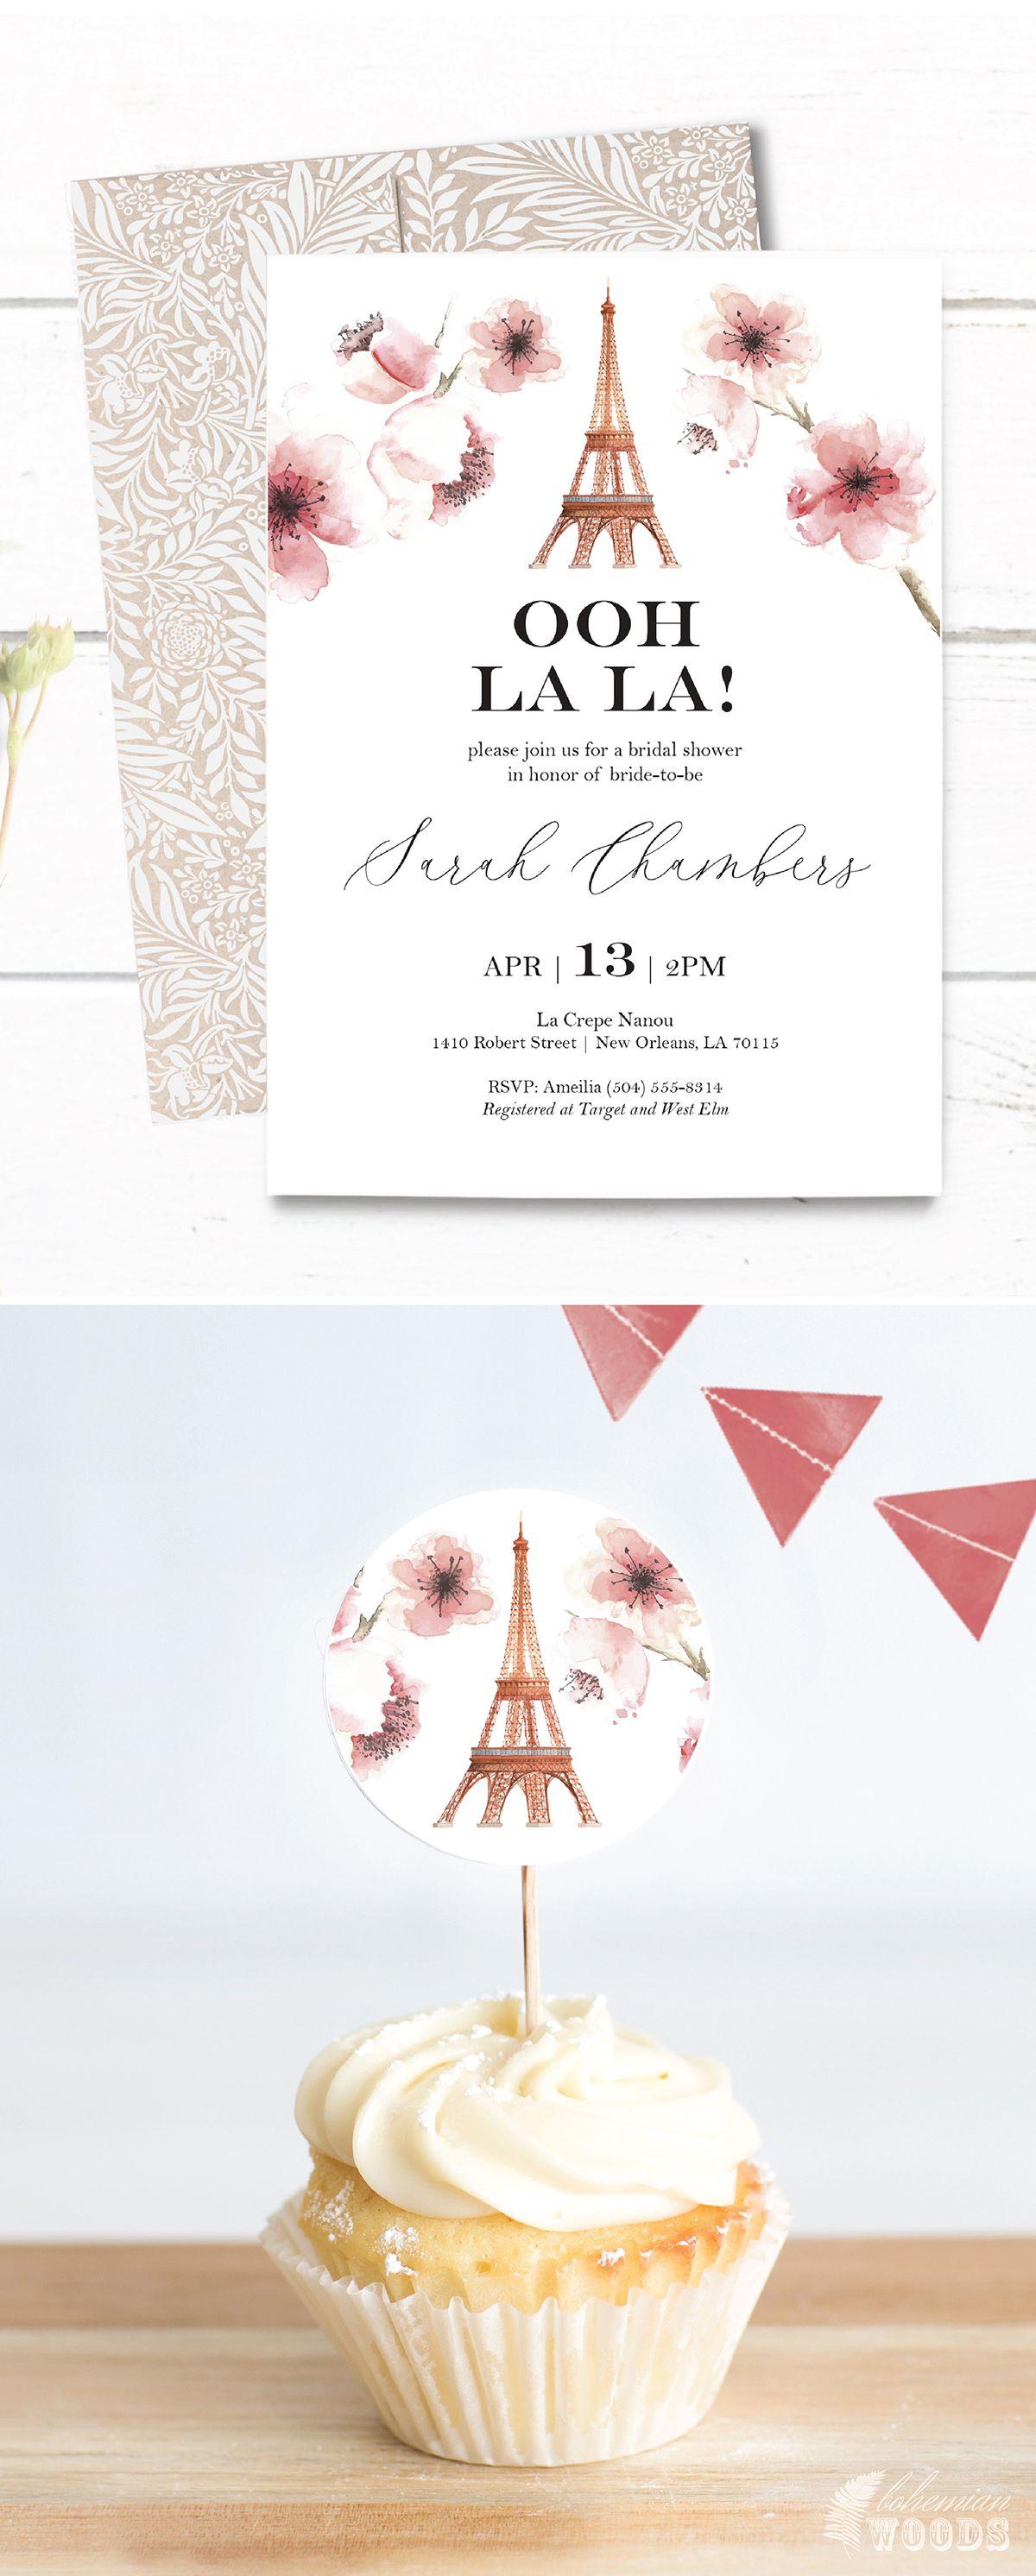 Paris Bridal Shower Template Invitation